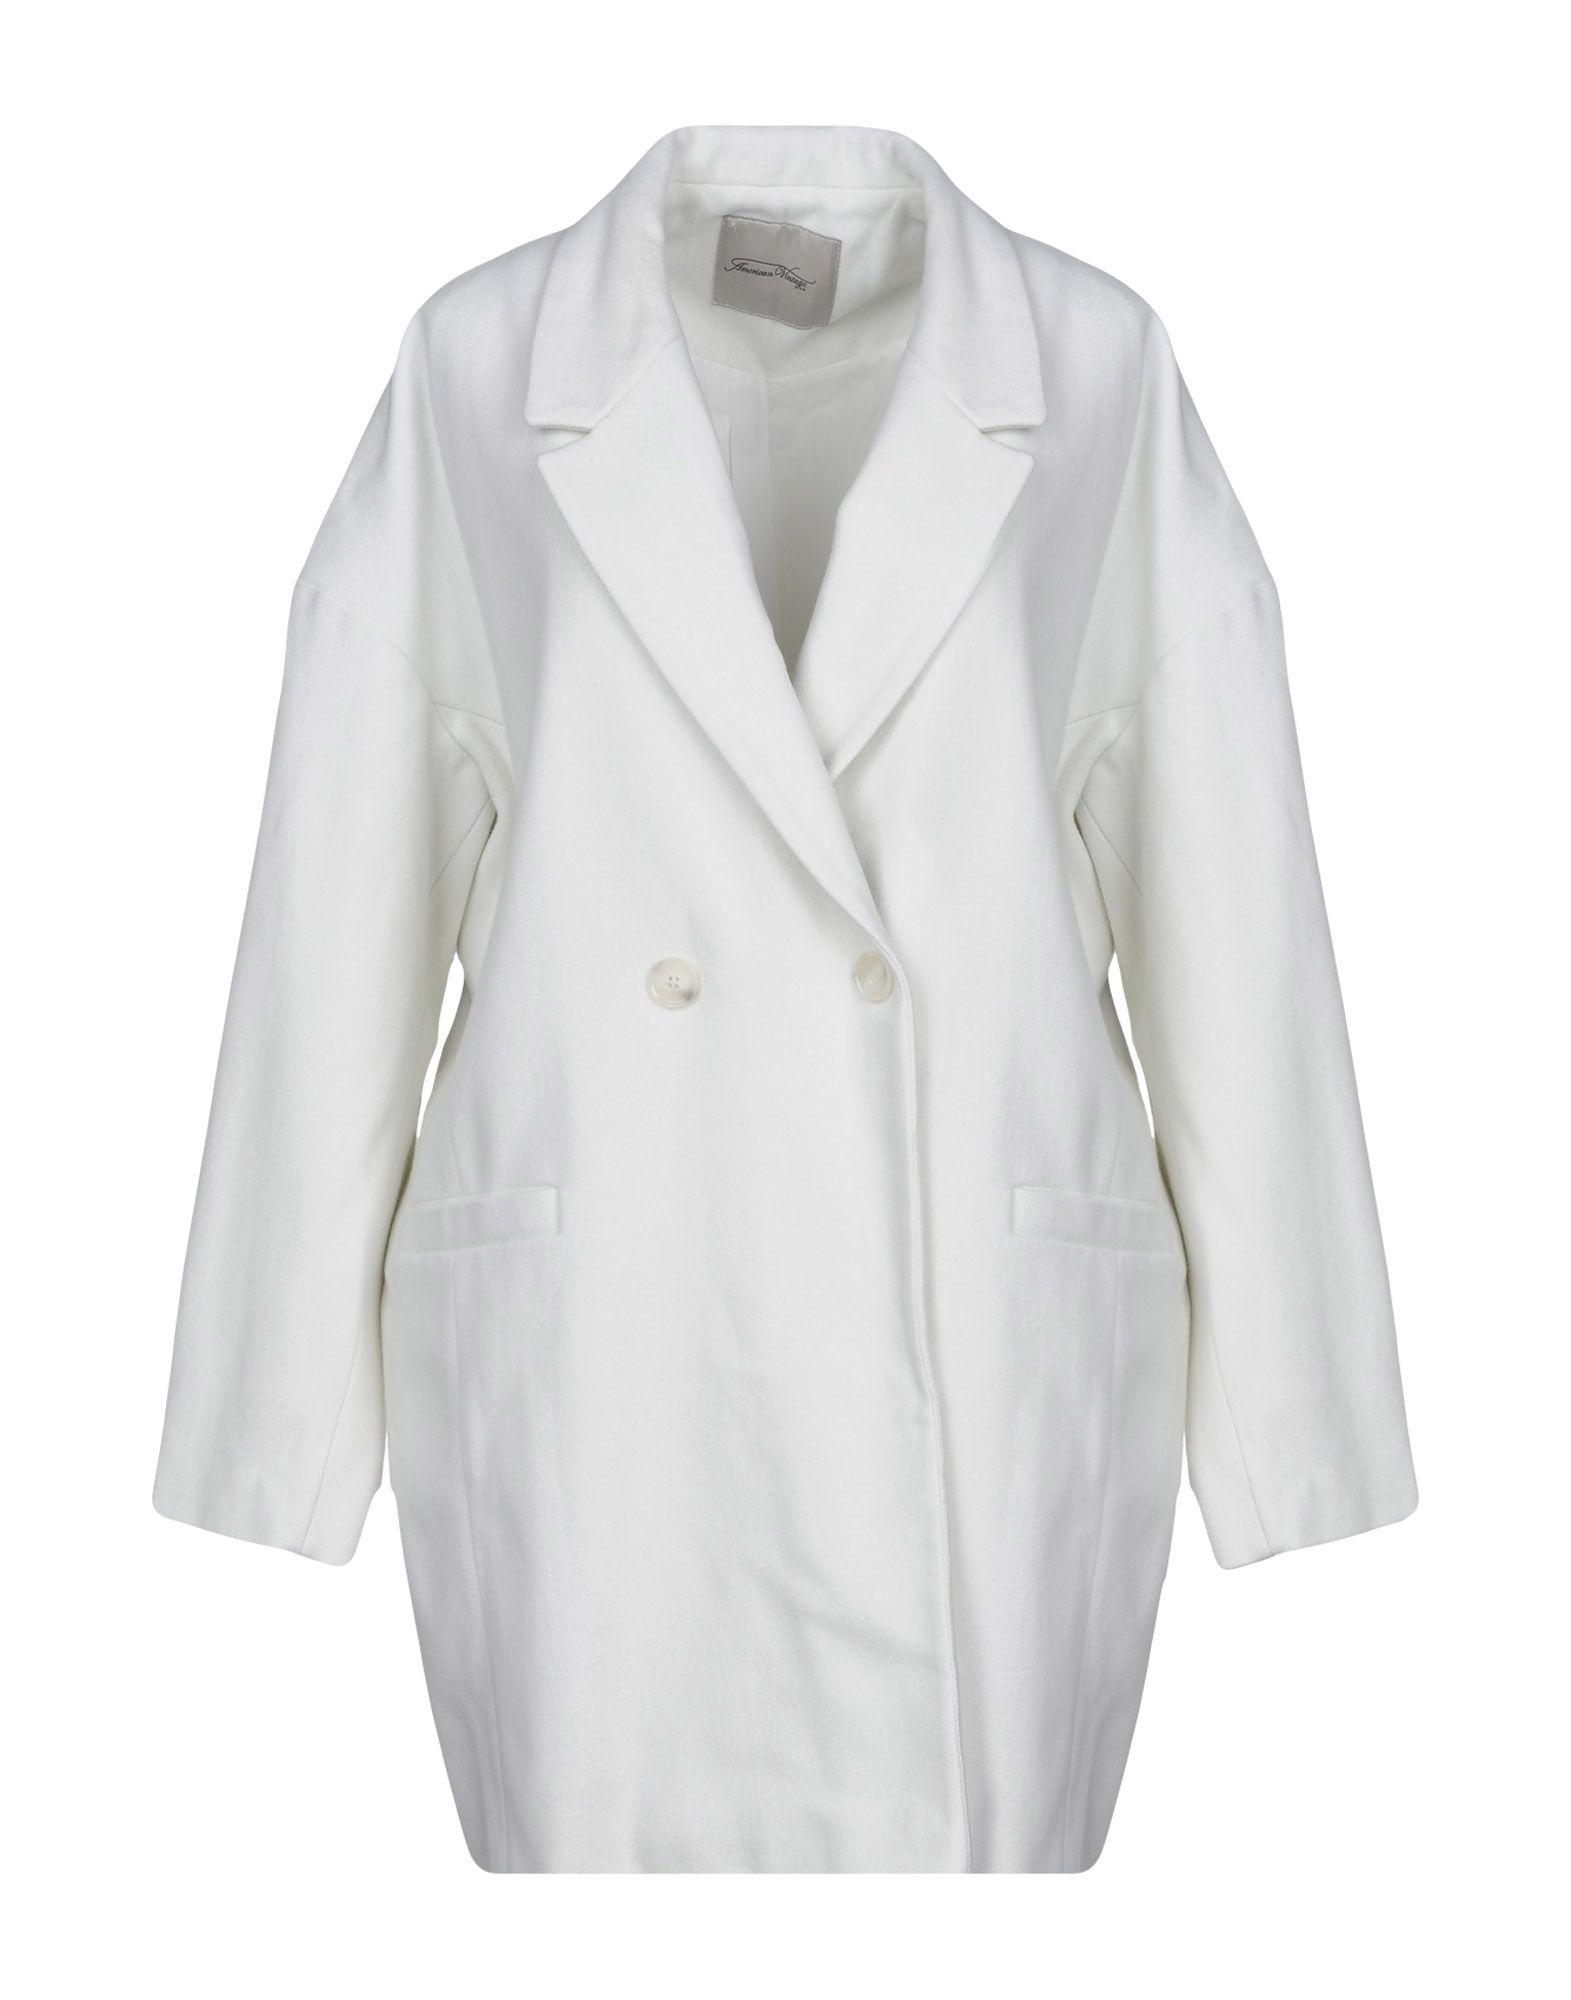 AMERICAN VINTAGE Coat in Light Grey